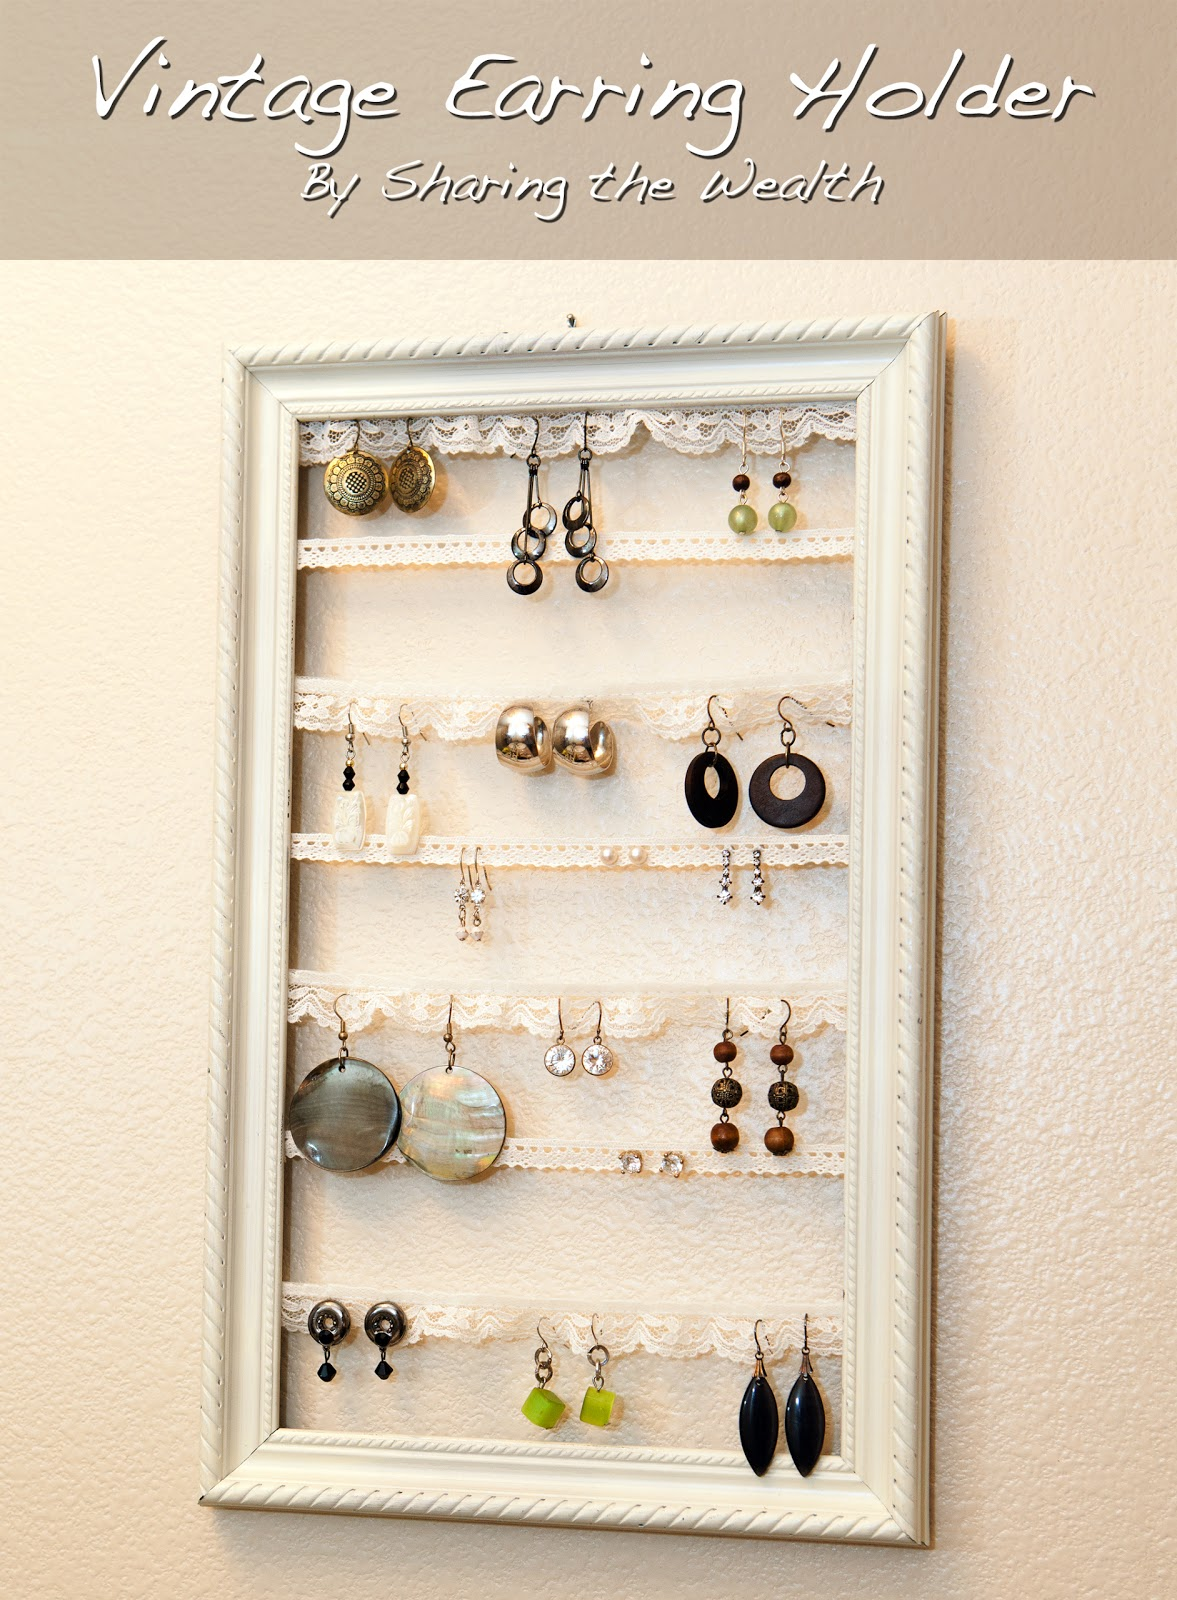 Sharing the Wealth: Vintage Earring Holder